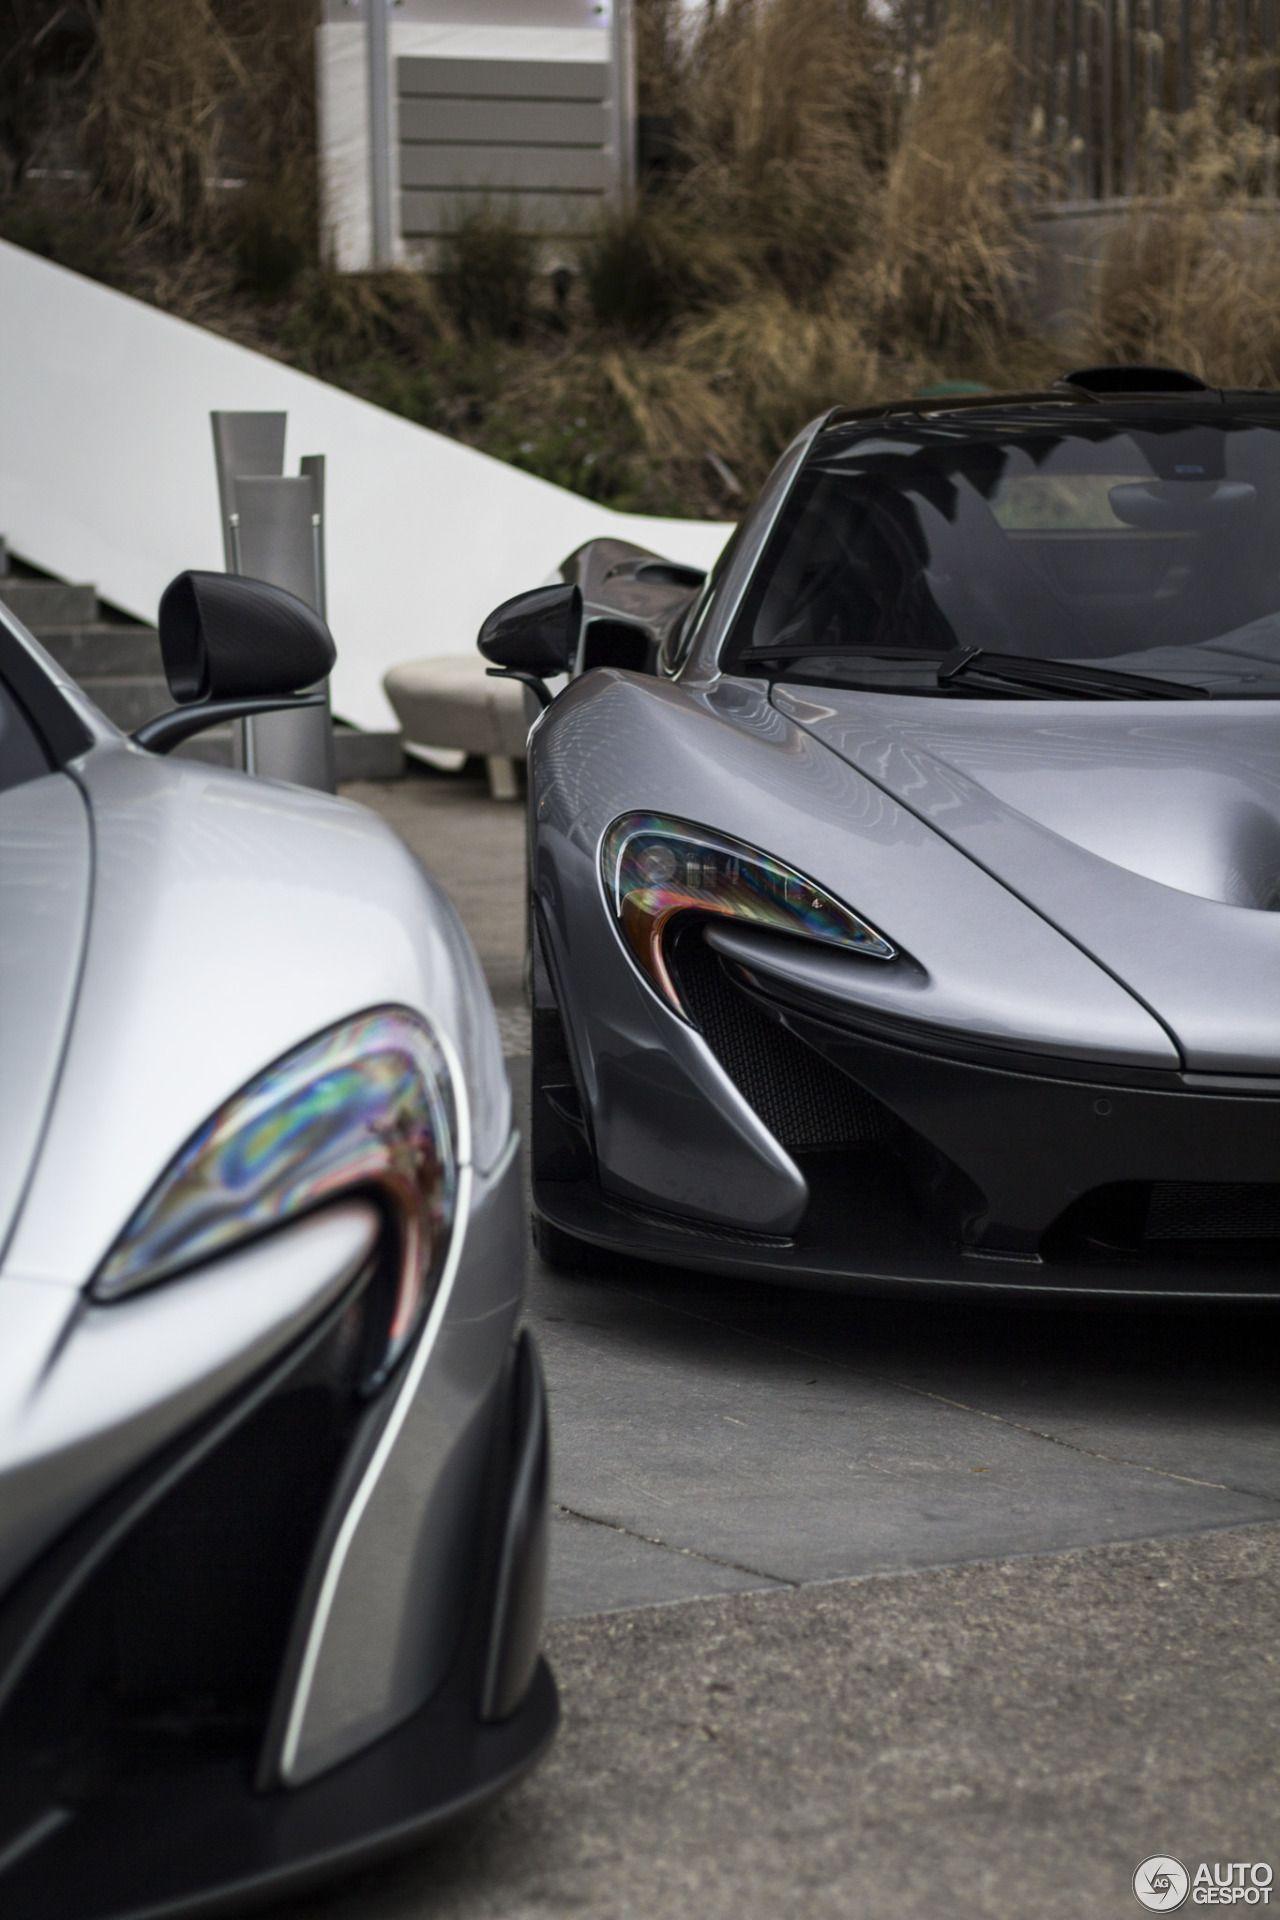 McLaren P1 Mclaren p1, Mclaren, Cool cars